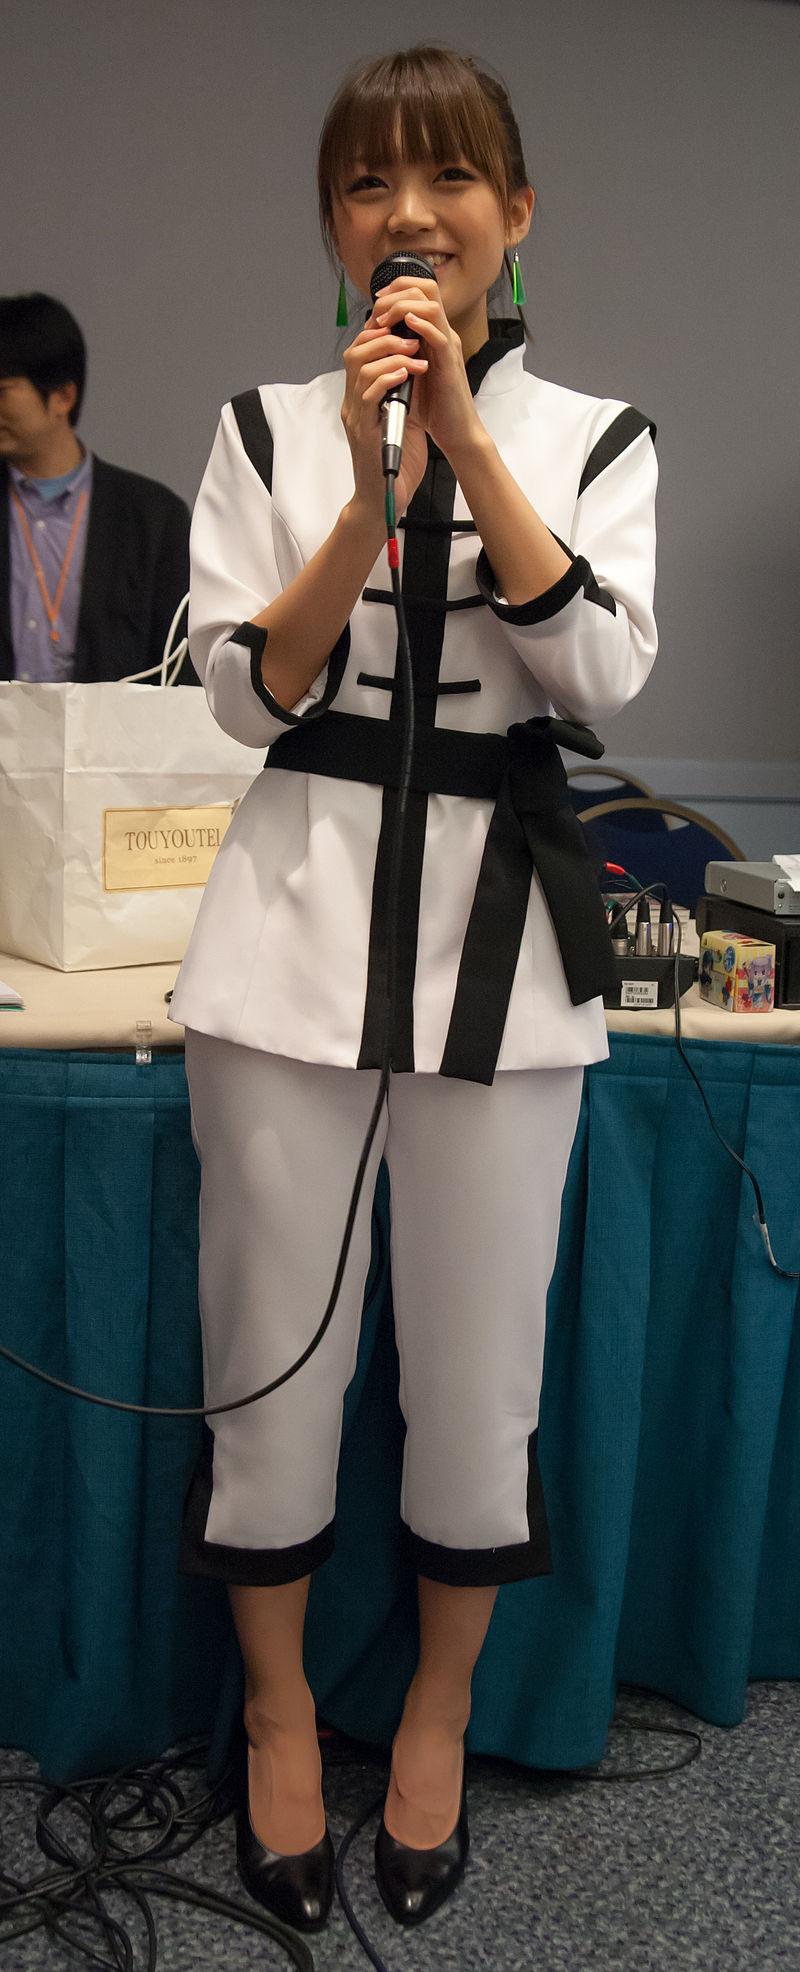 Suzuko Mimori (三森 すずこ) at AWA 2012 (4).jpg